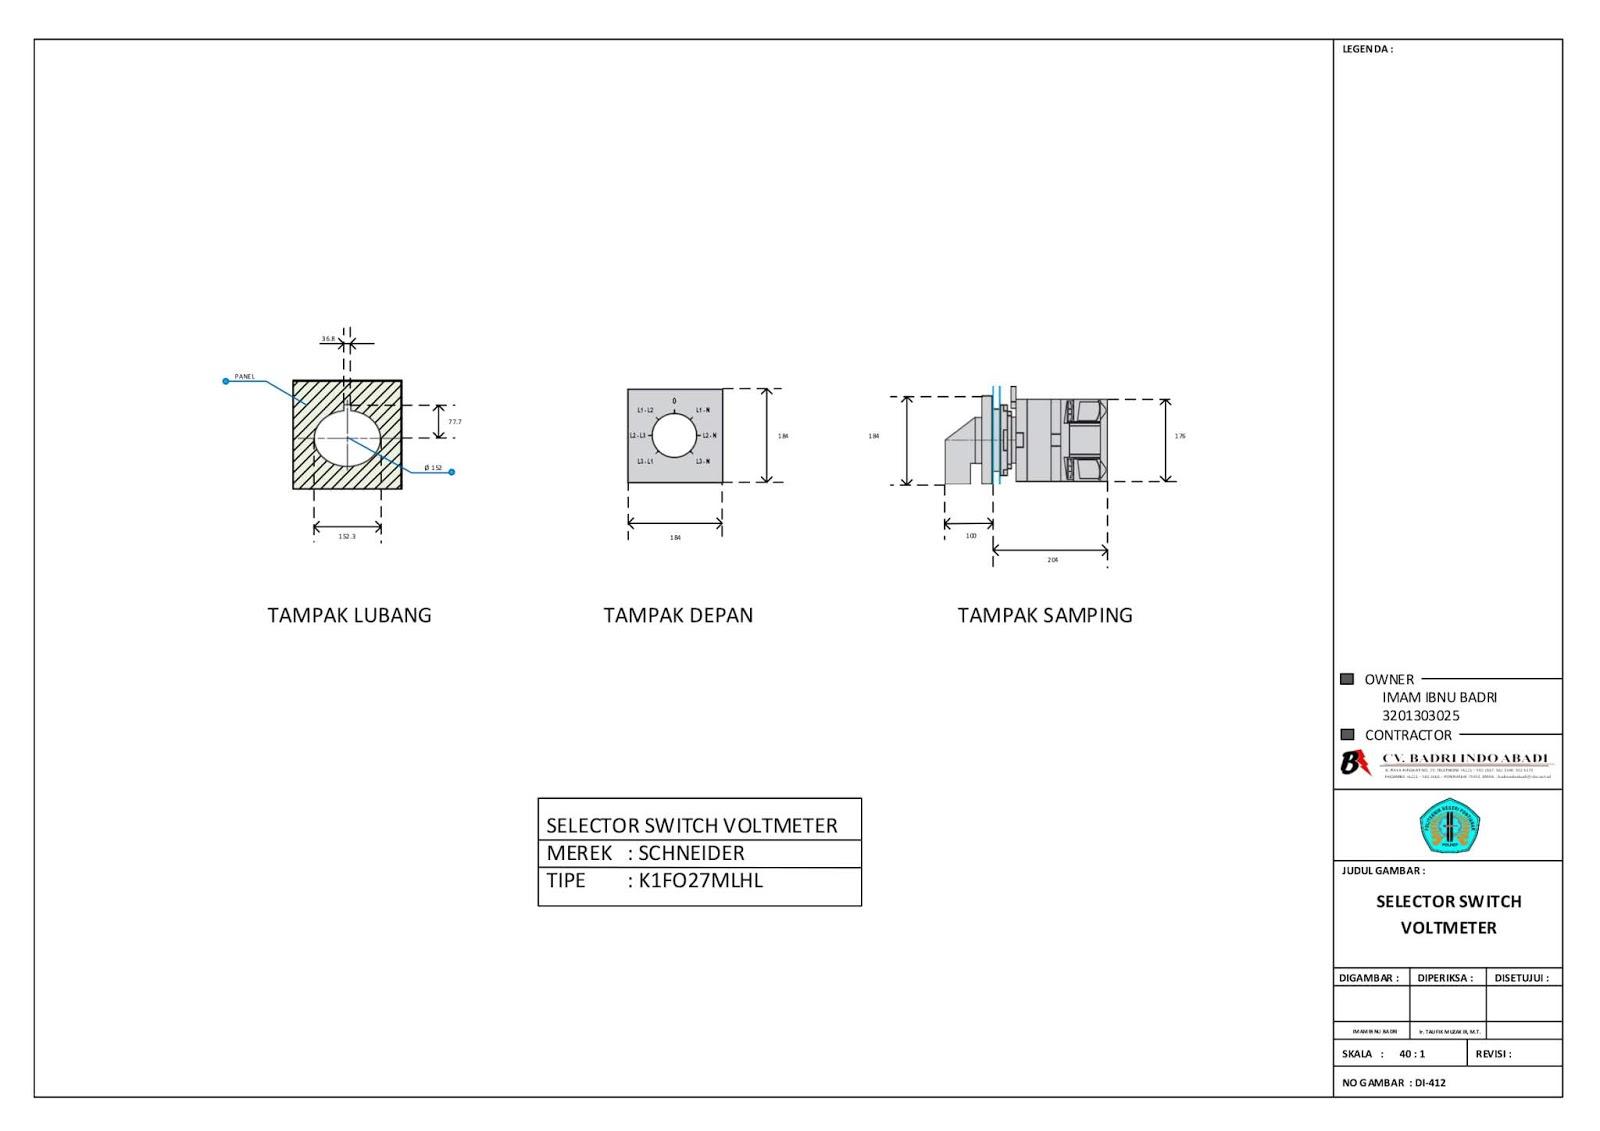 Gambar Selector Switch Voltmeter